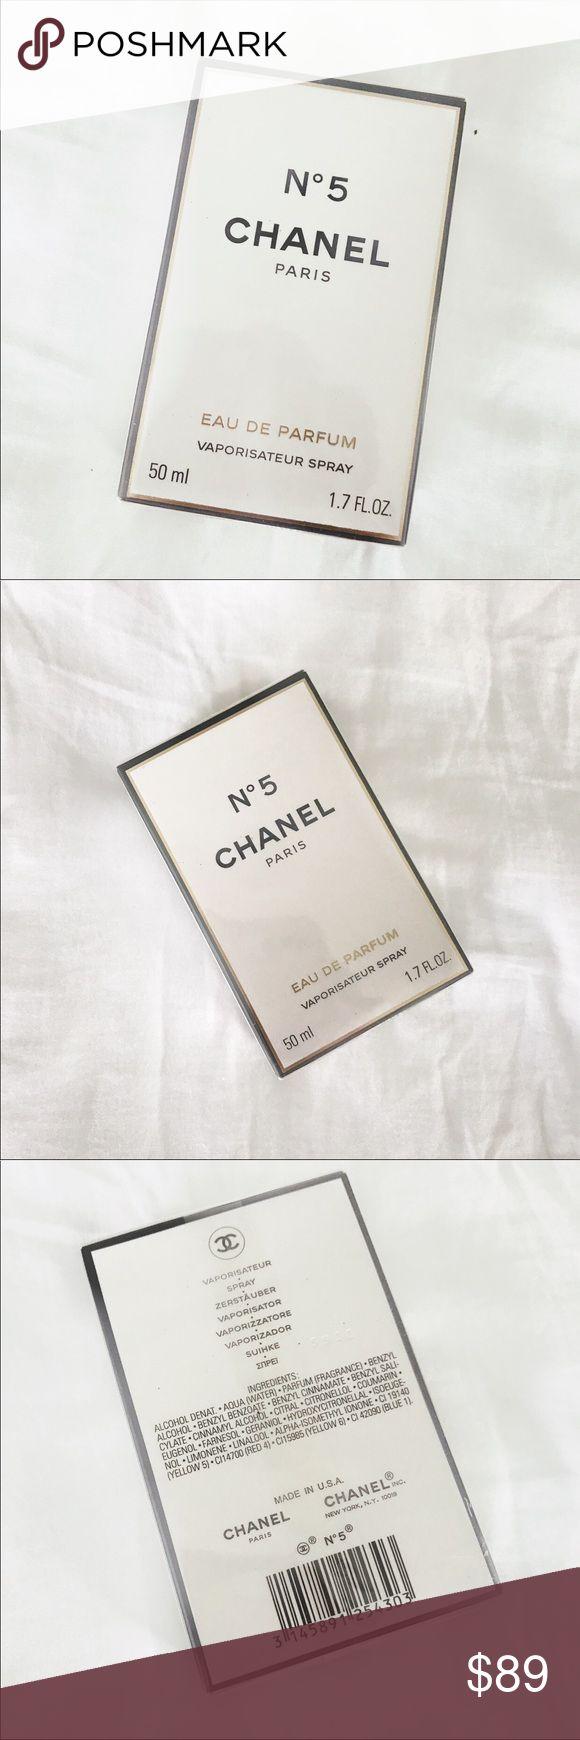 CHANEL No 5 Eau De Parfum 50ml 1.7 FL OZ. Brand new in box CHANEL Makeup